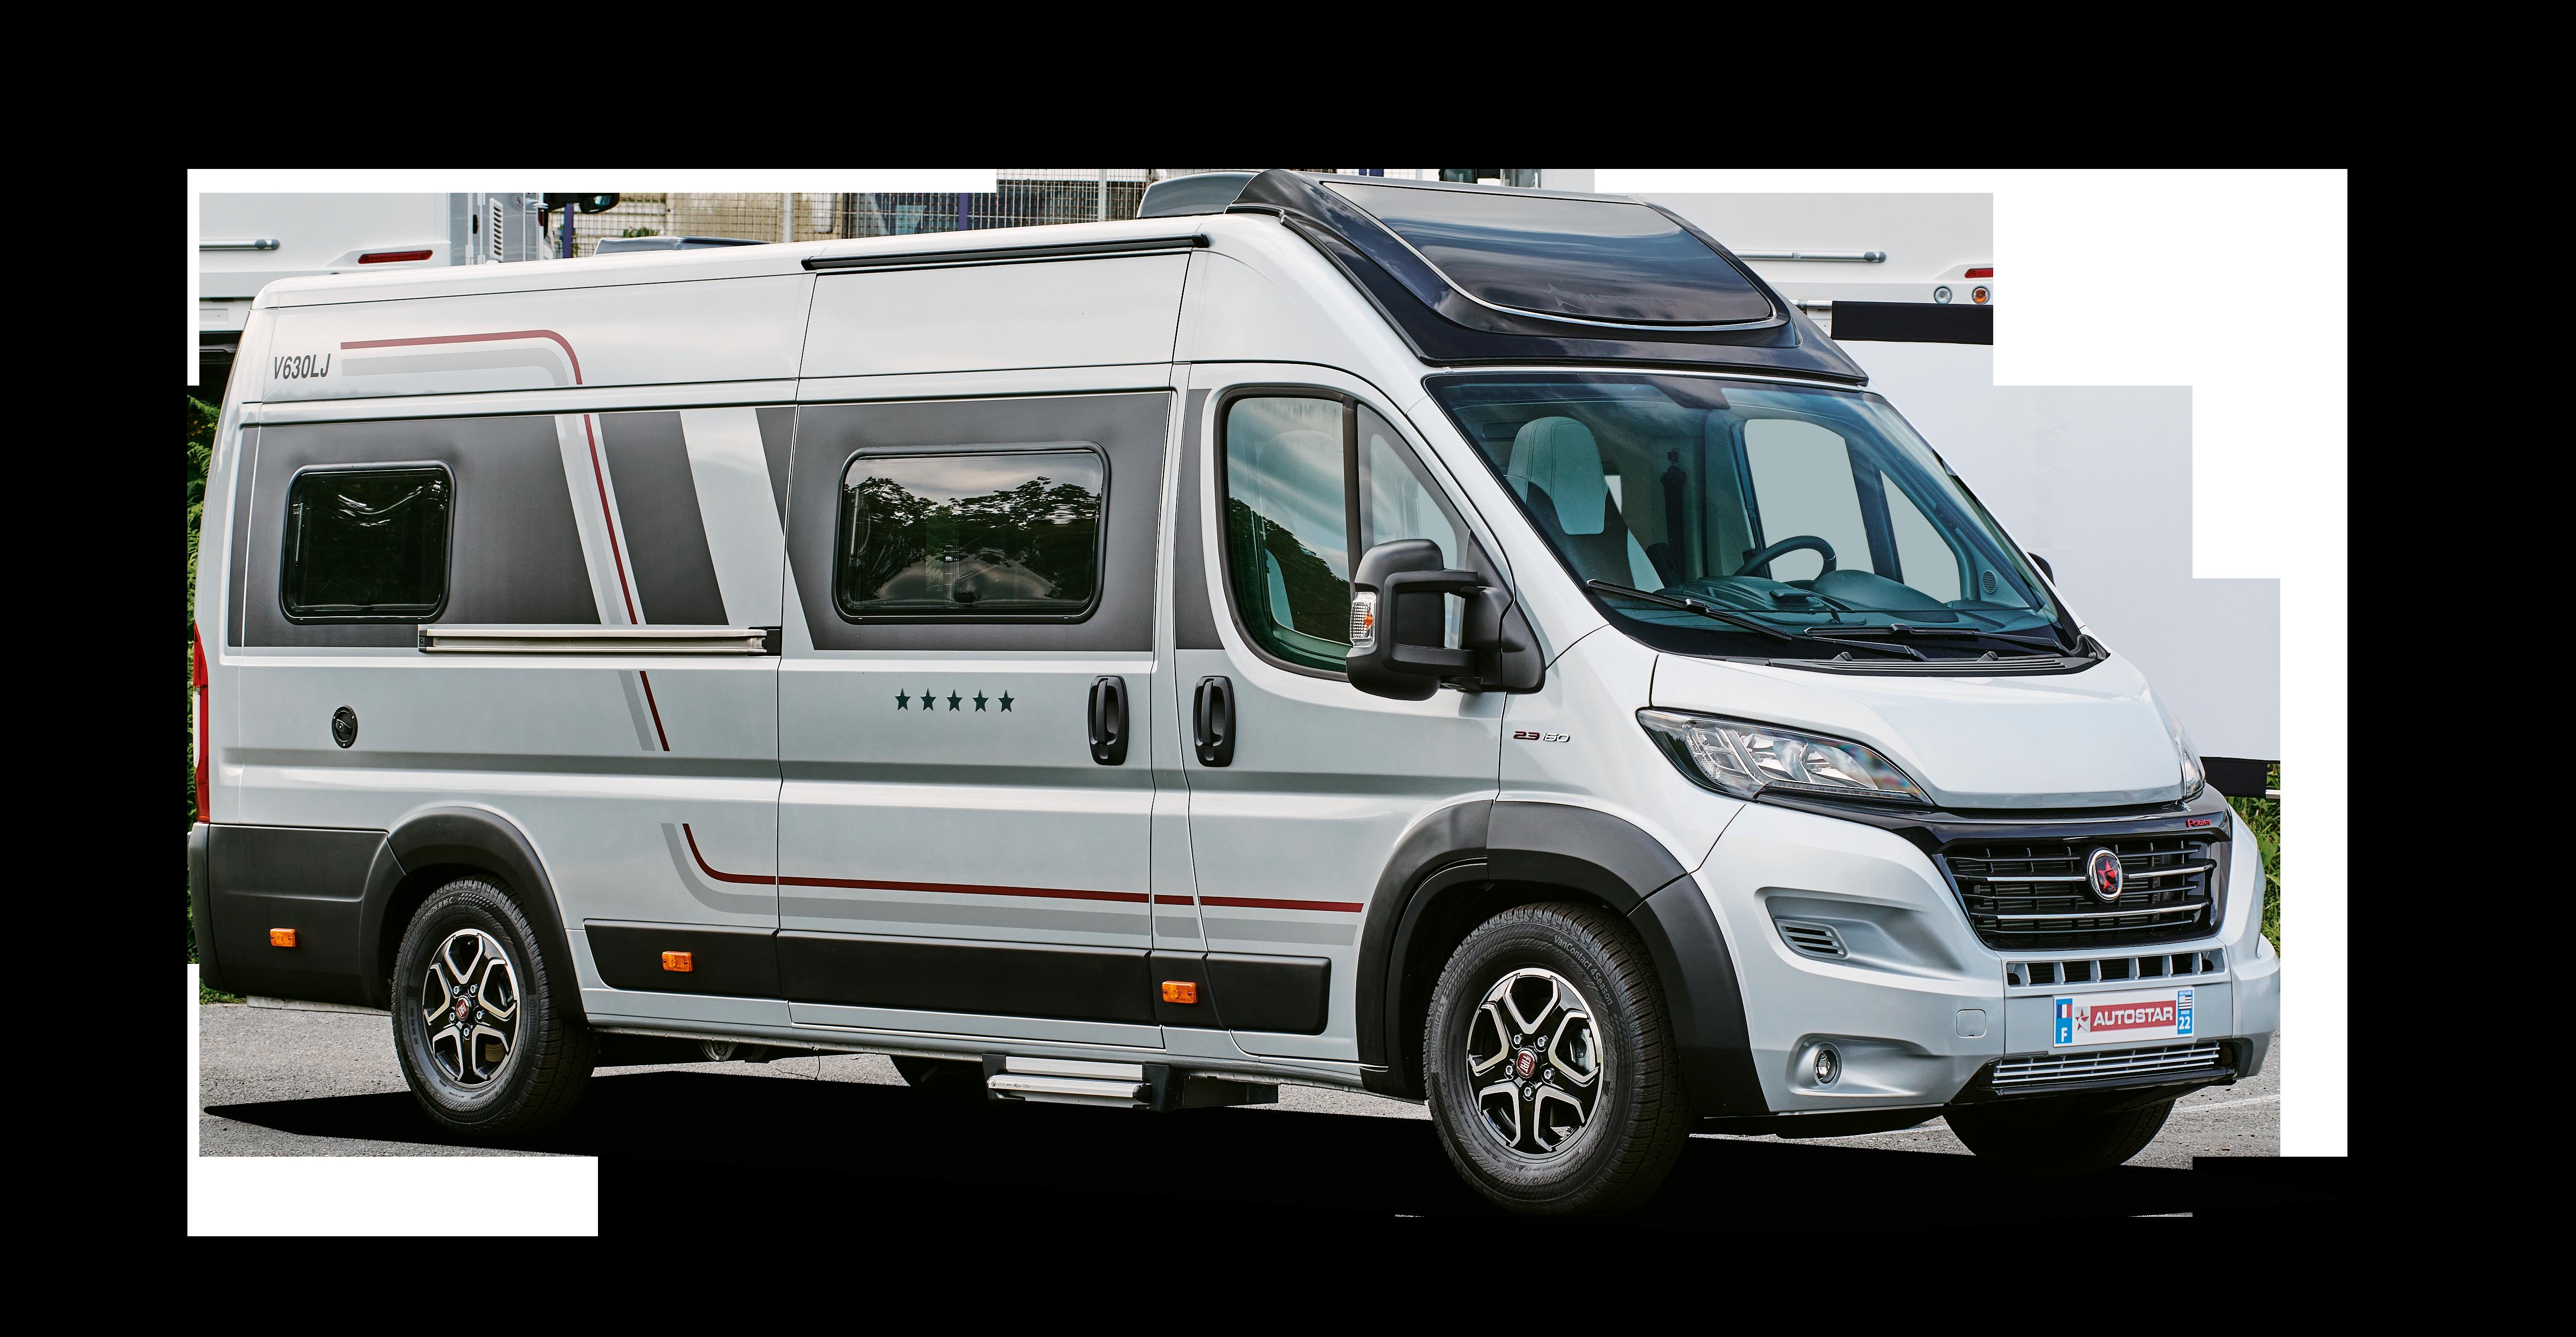 Van V630 LJ Design Edition